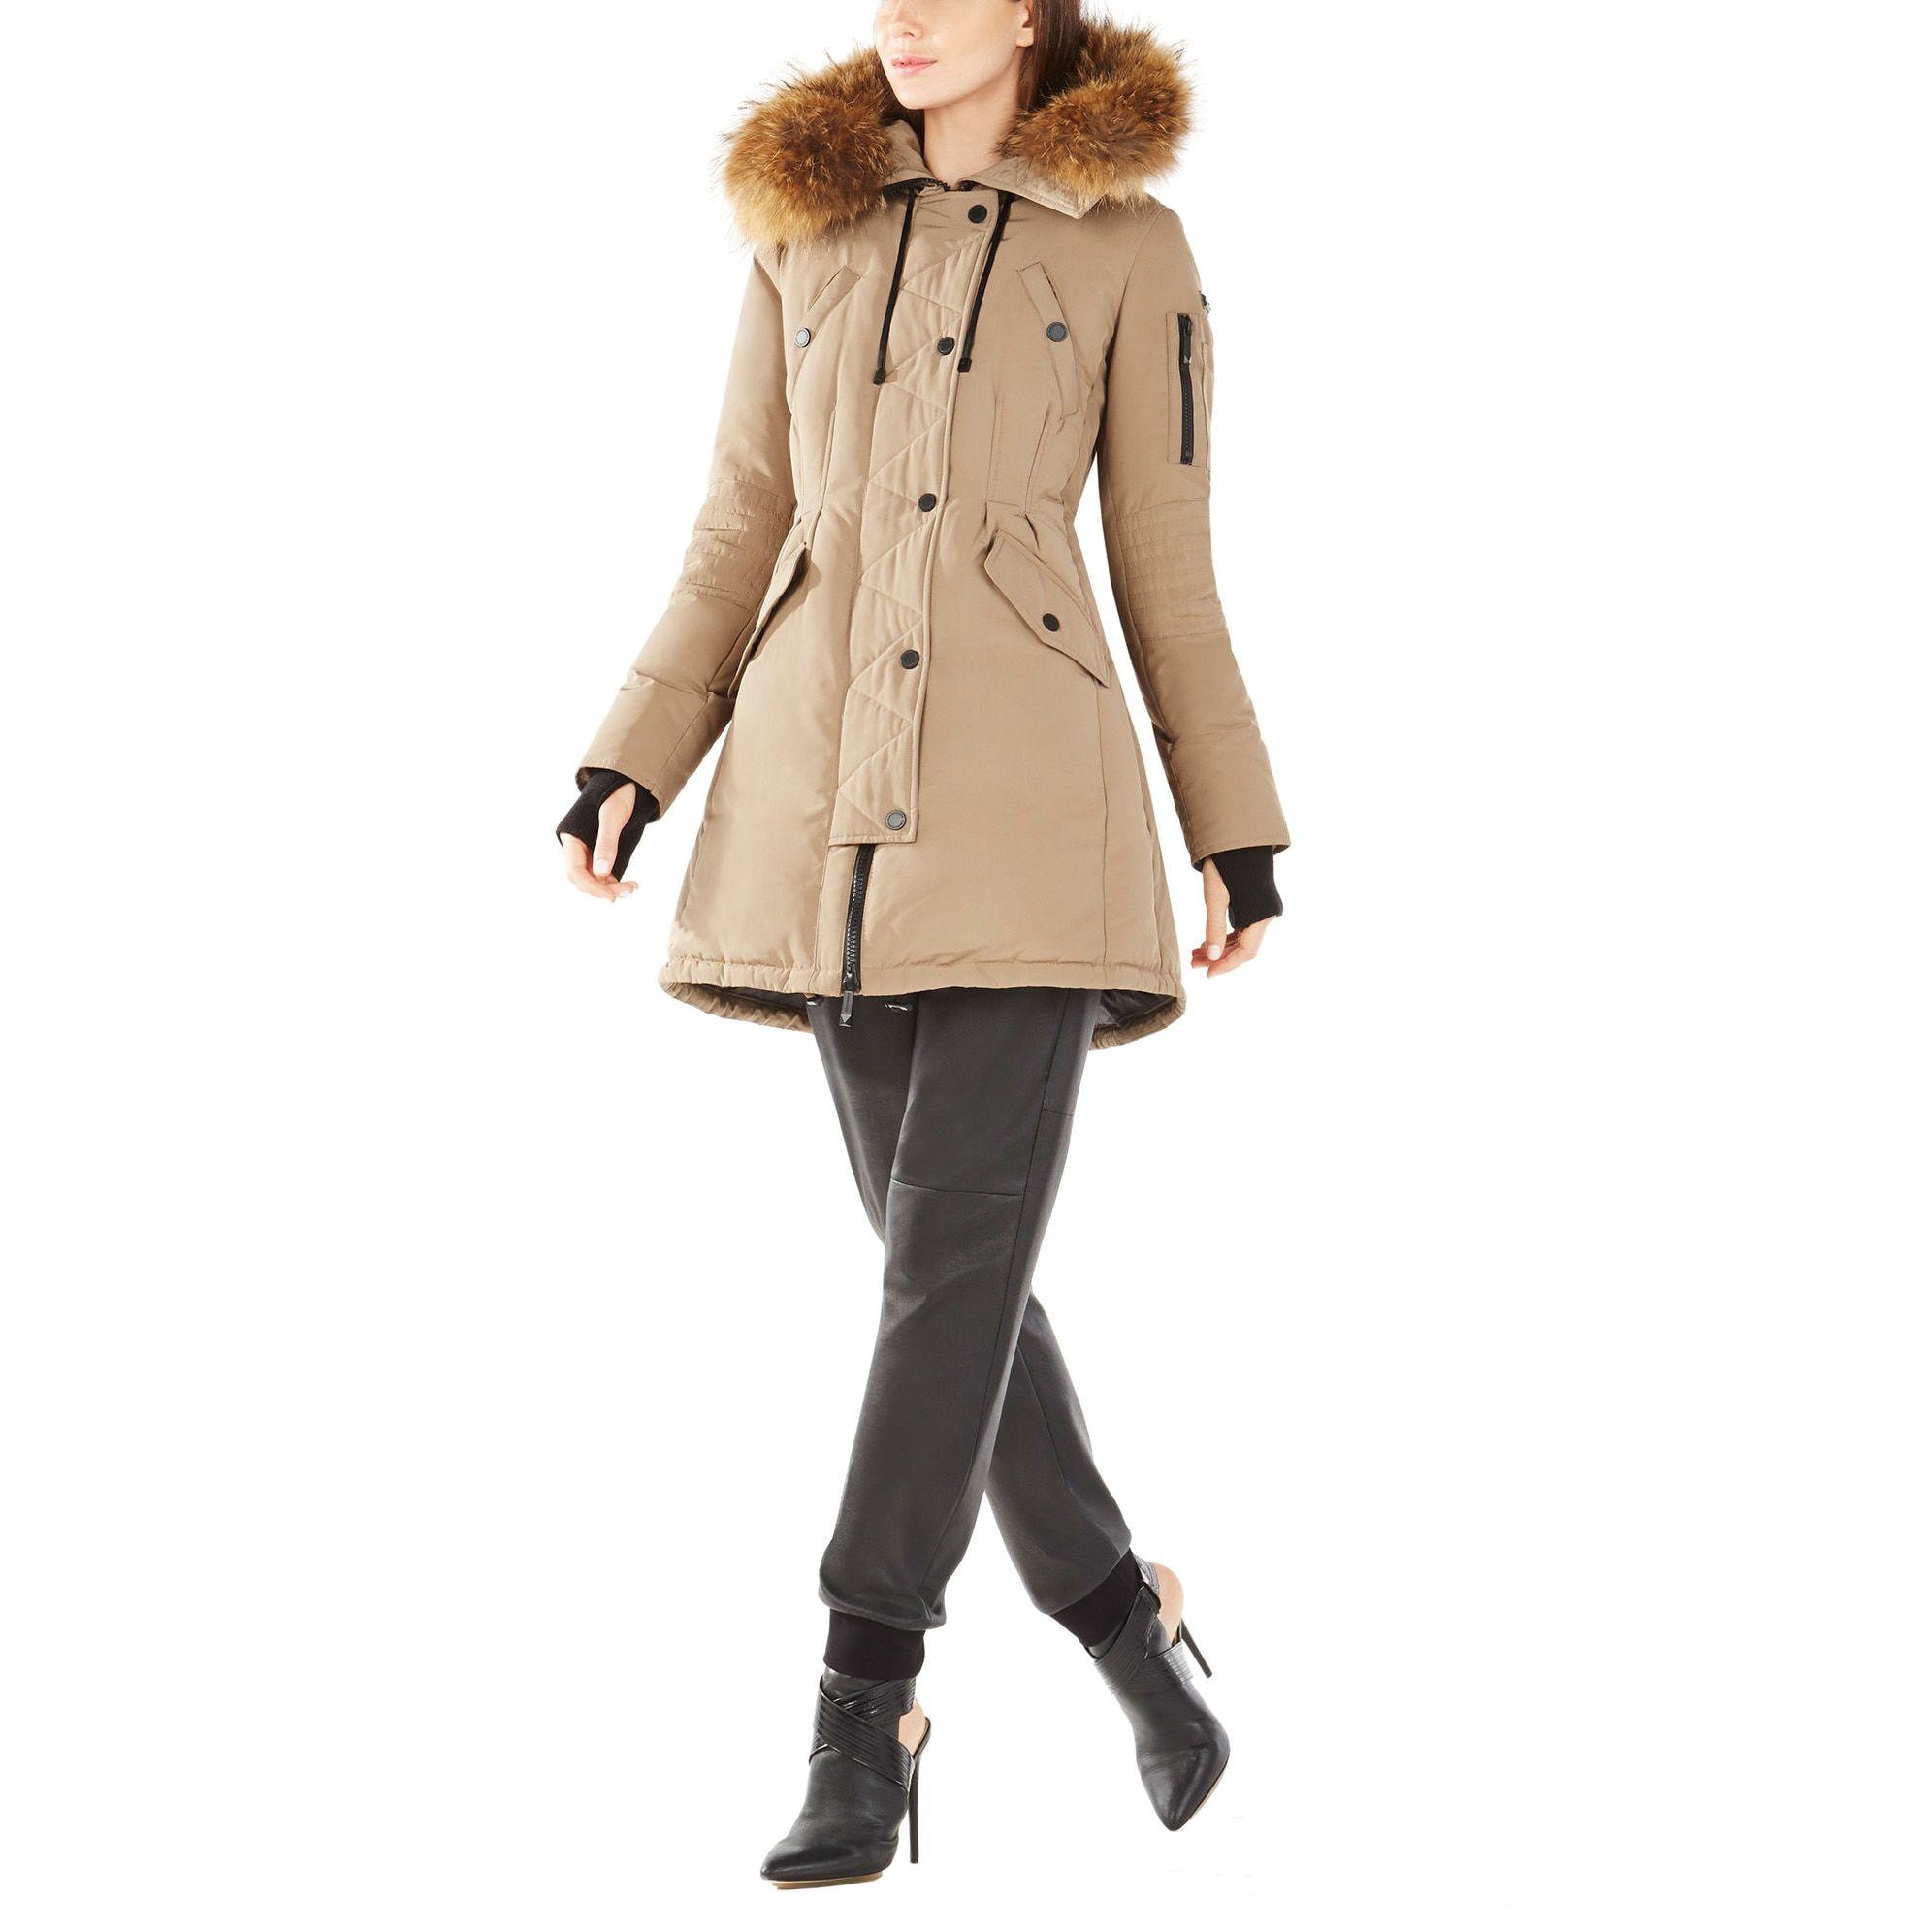 2363d52f5 BCBG Max Azria BCBGMaxazria Women's Sahara Puffer Coat | Clothes ...